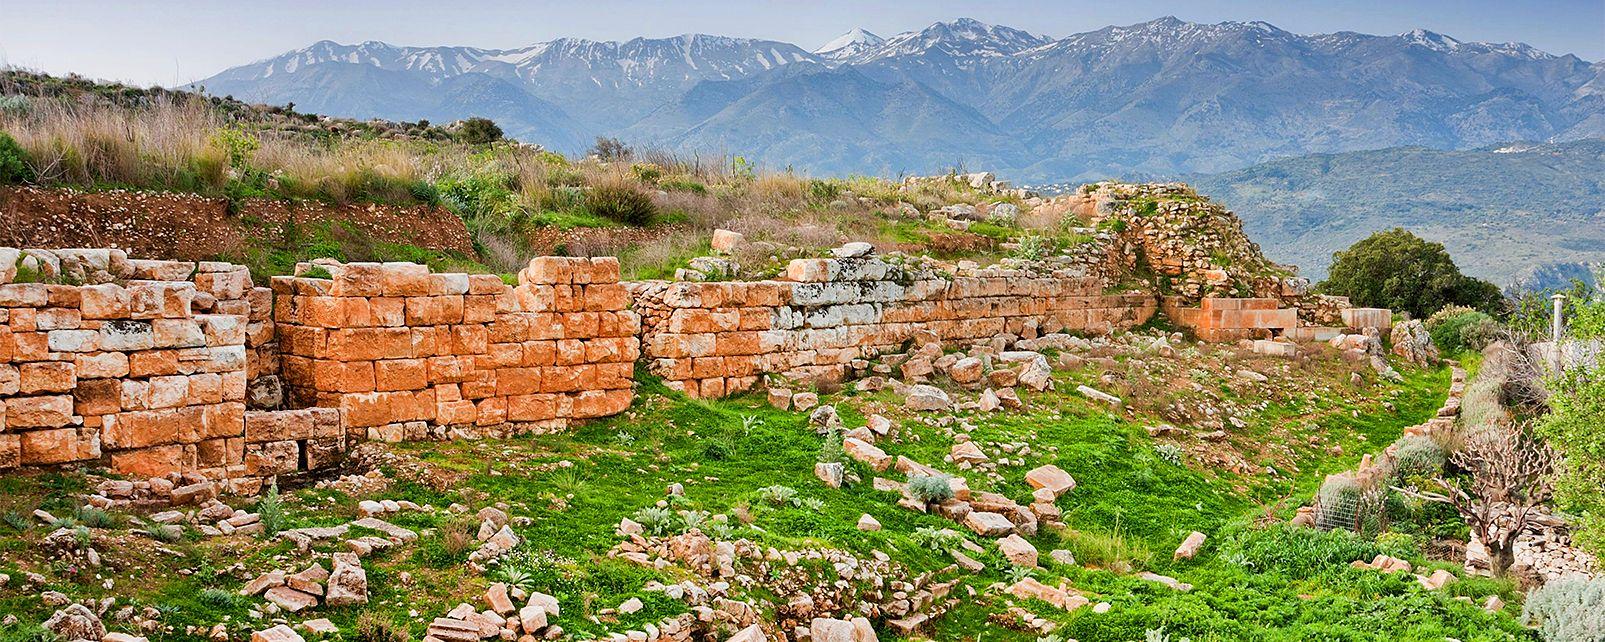 Aptéra, Apera, Monuments, Crete